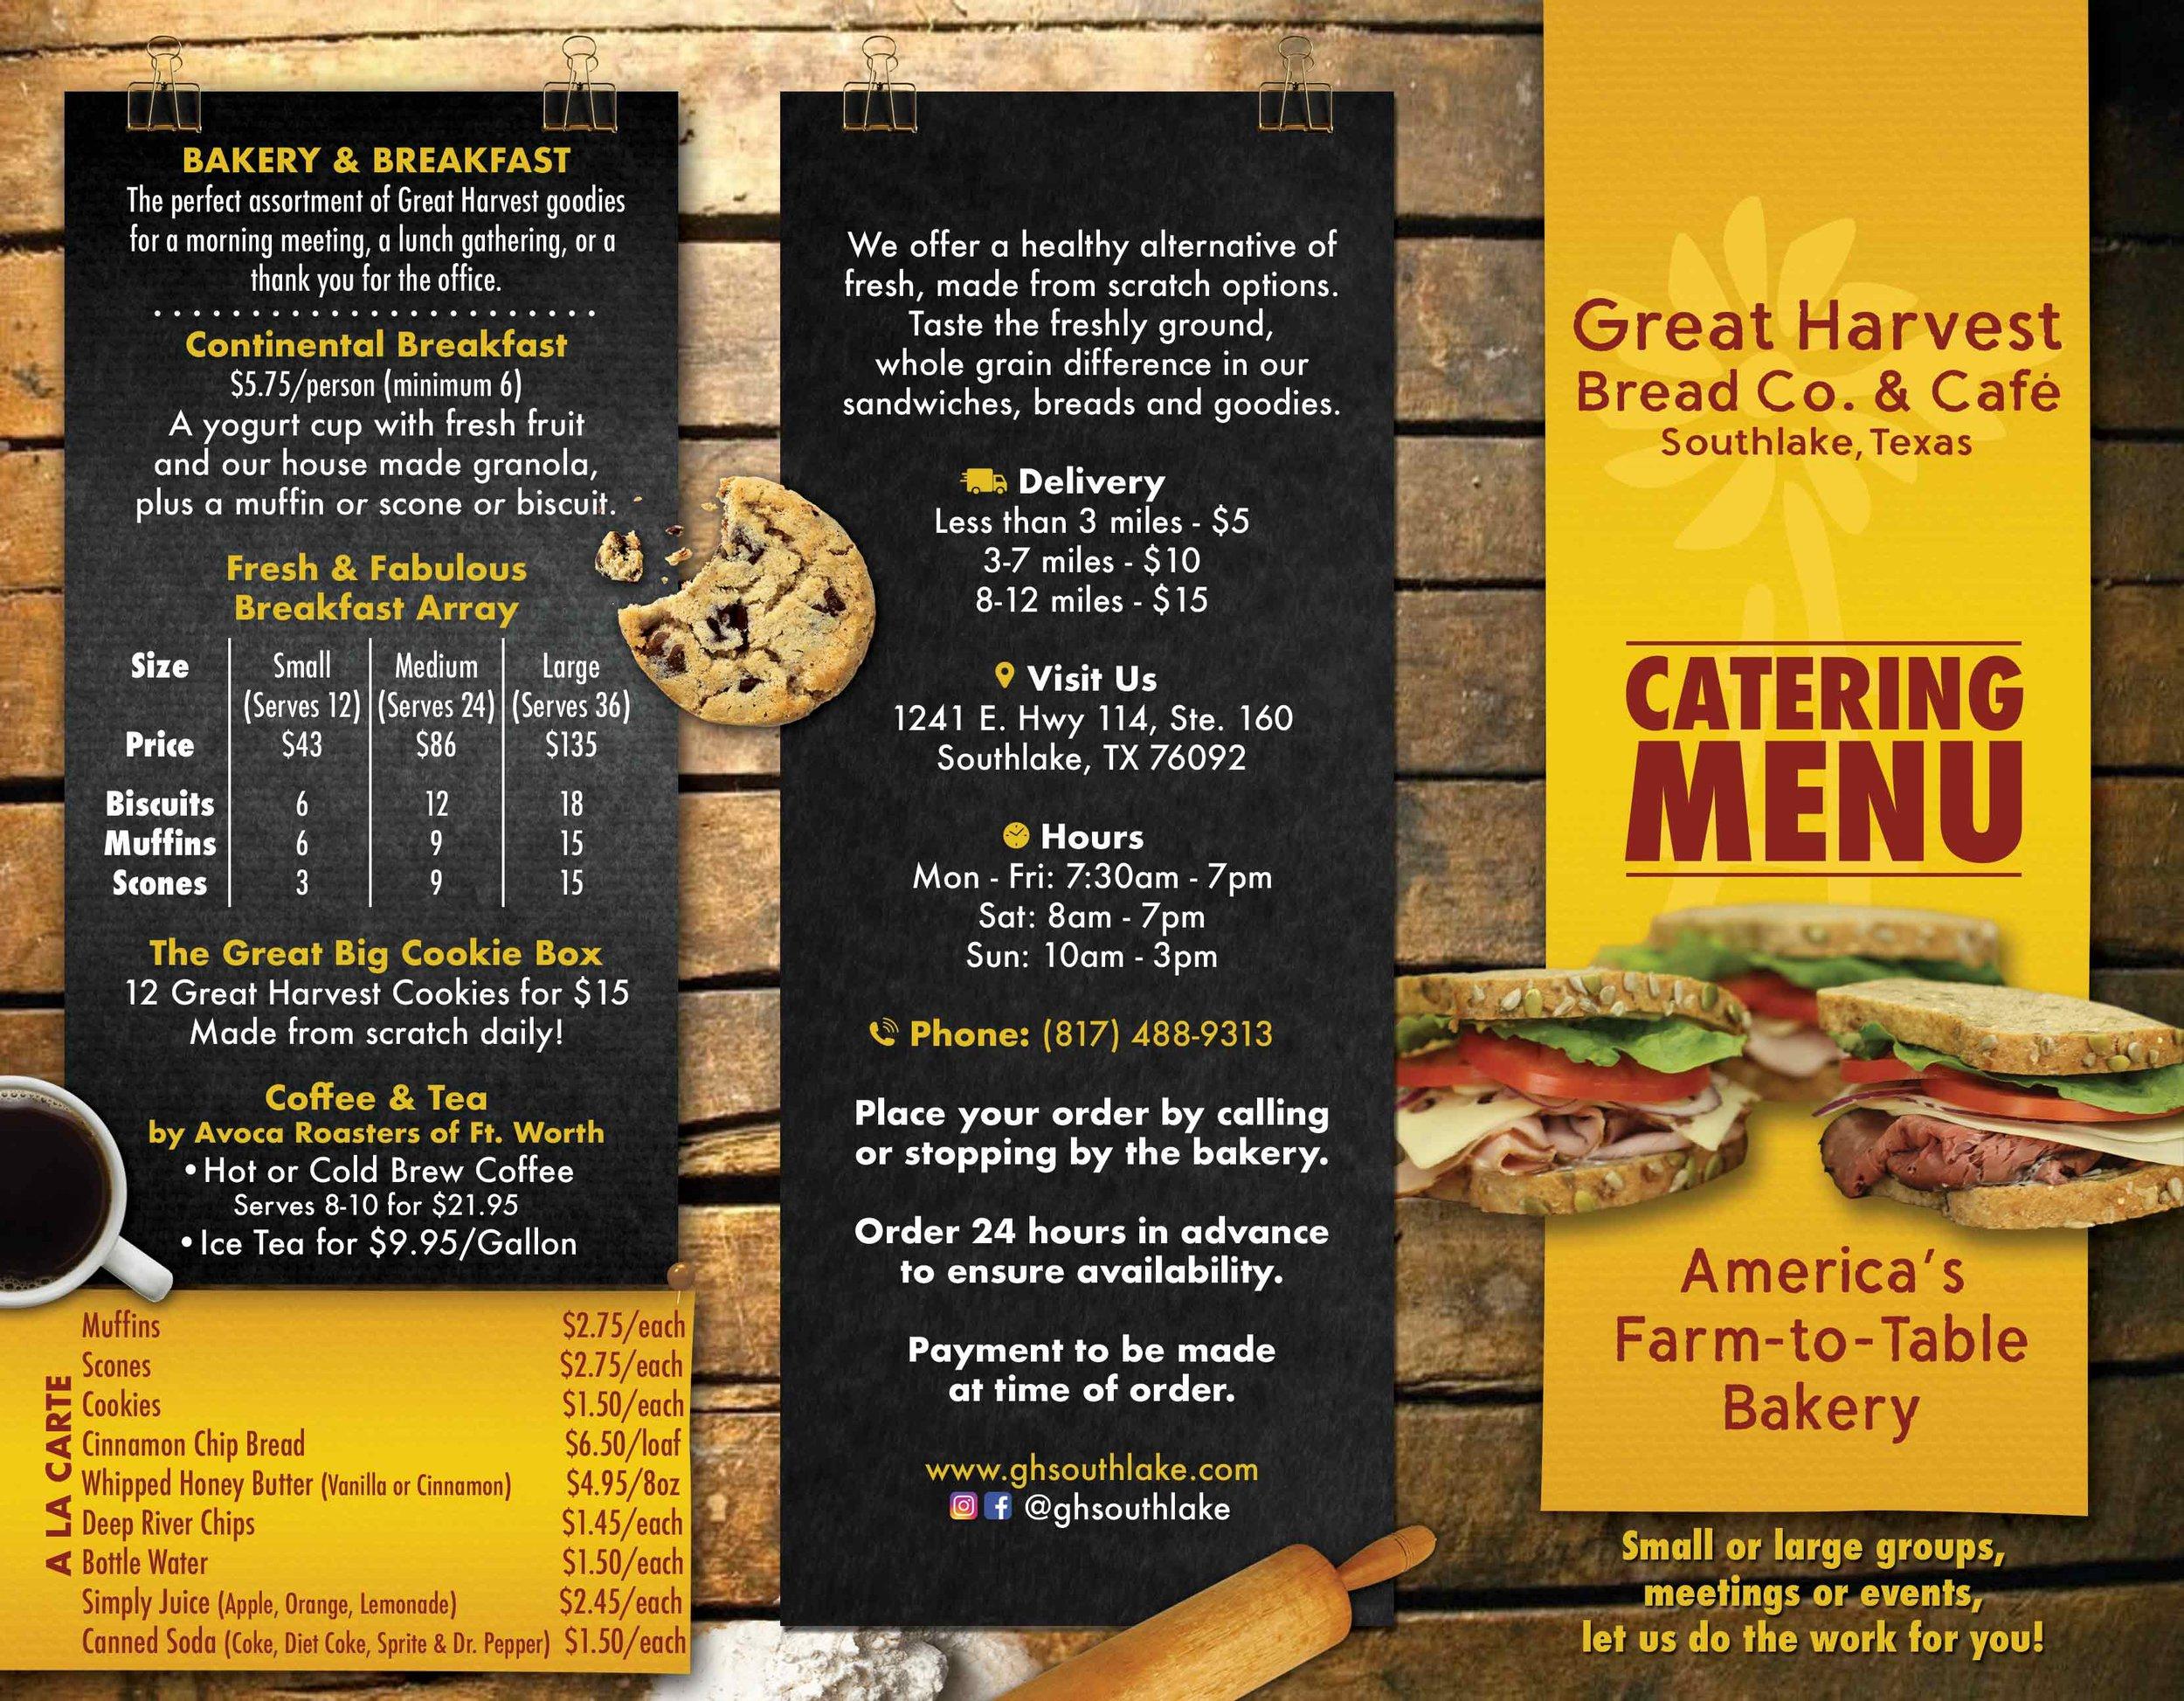 GH-Catering-Menu-Outside-Web.jpg